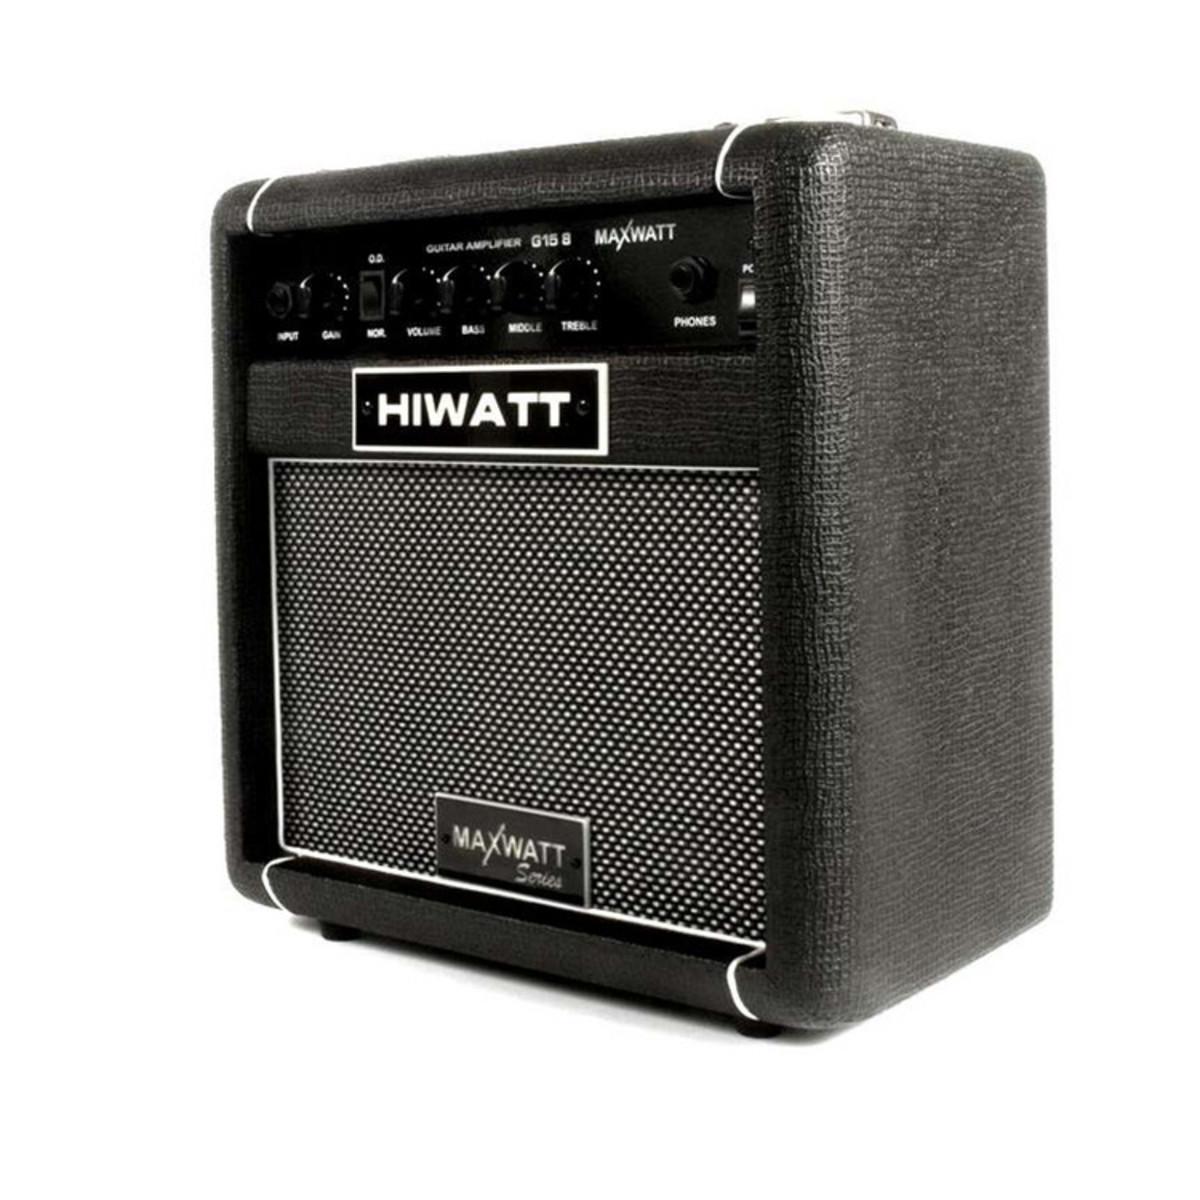 HIWATT MAXWATT G15-8 COMBO AMPLIFICATORE DA STUDIO PER CHITARRA 15 WATT 8 1